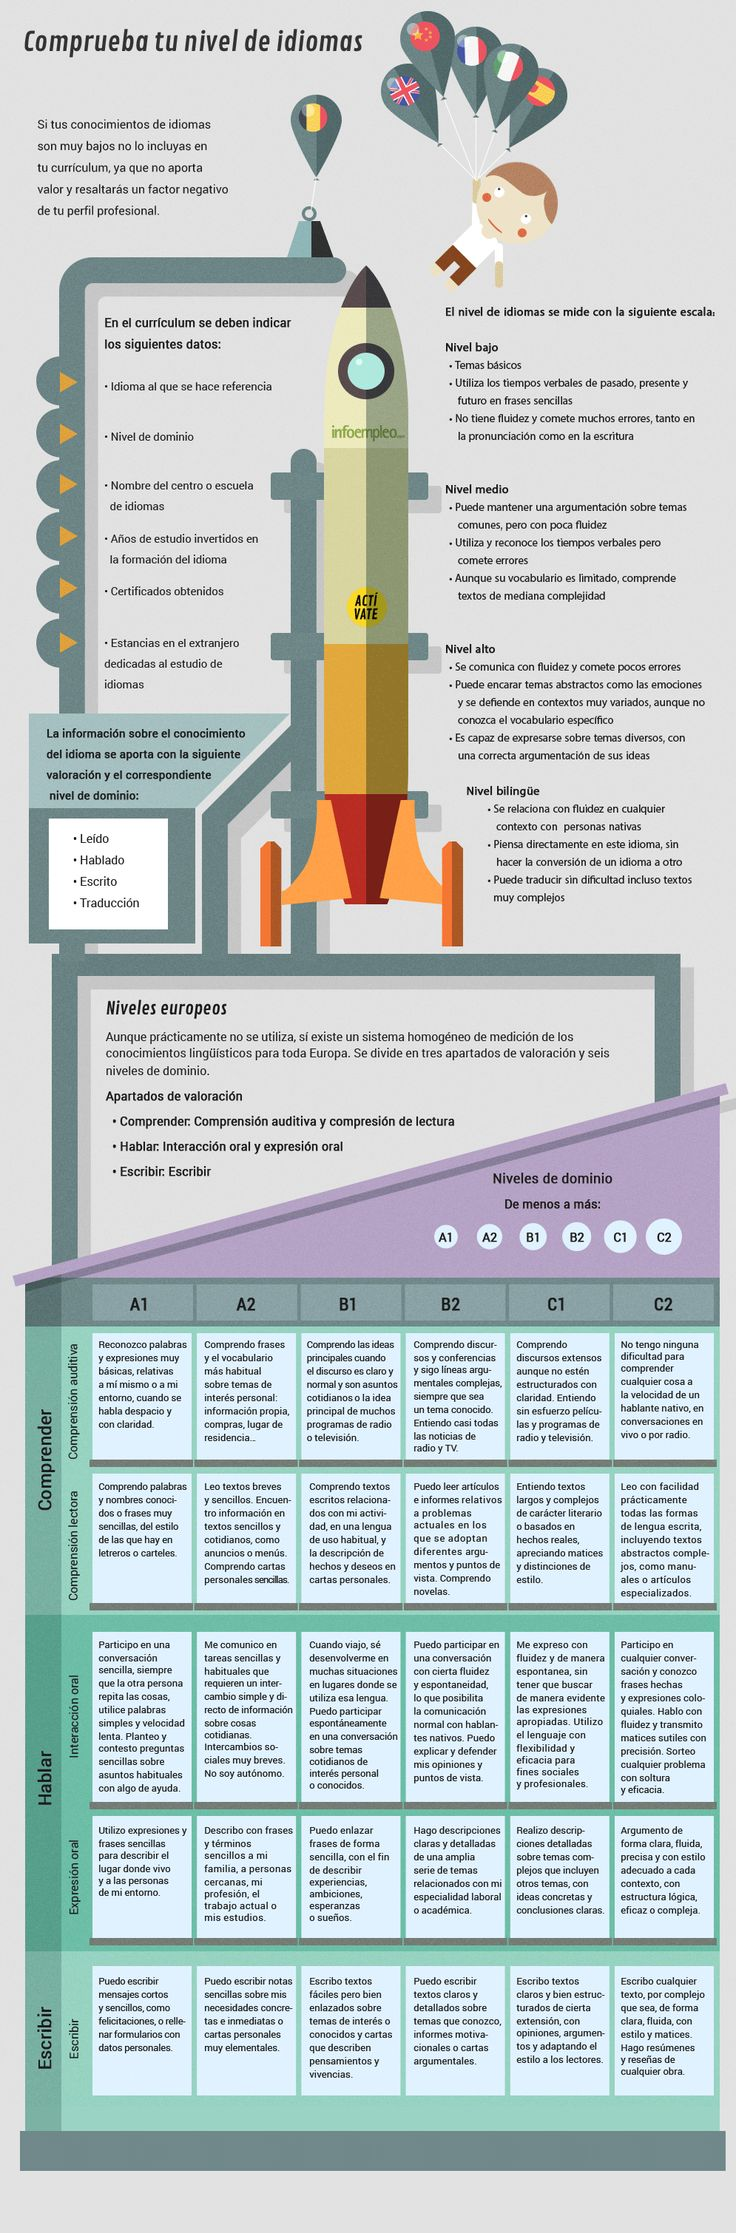 infografia_nivel_de_idiomas_para_tu_curriculum.png (995×3020)